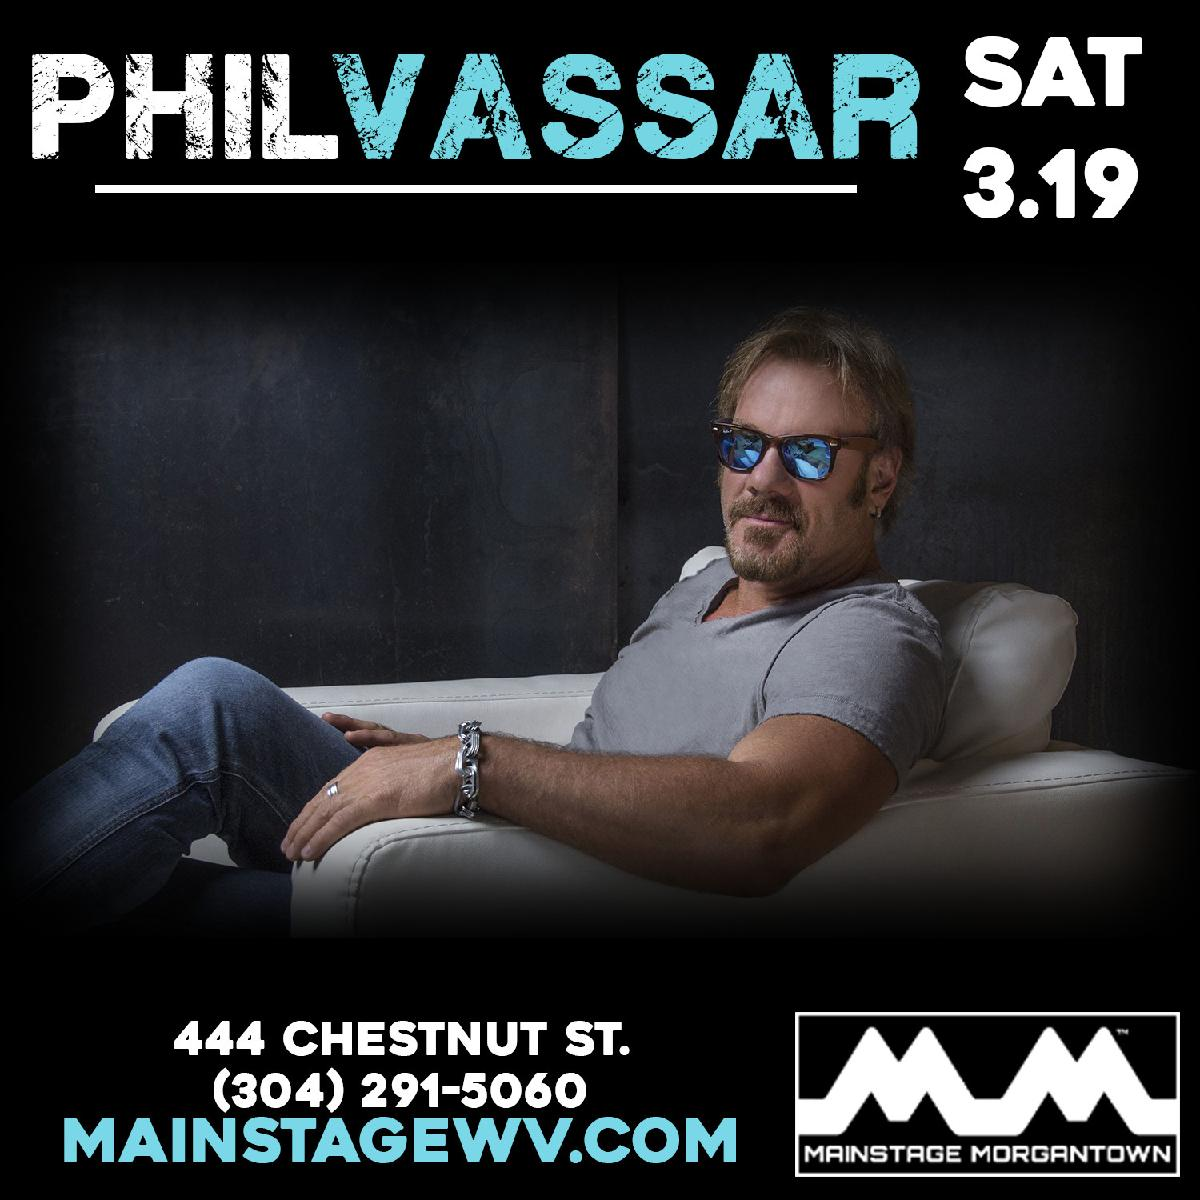 Phil Vassar at Mainstage Morgantown :: Mainstage Morgantown